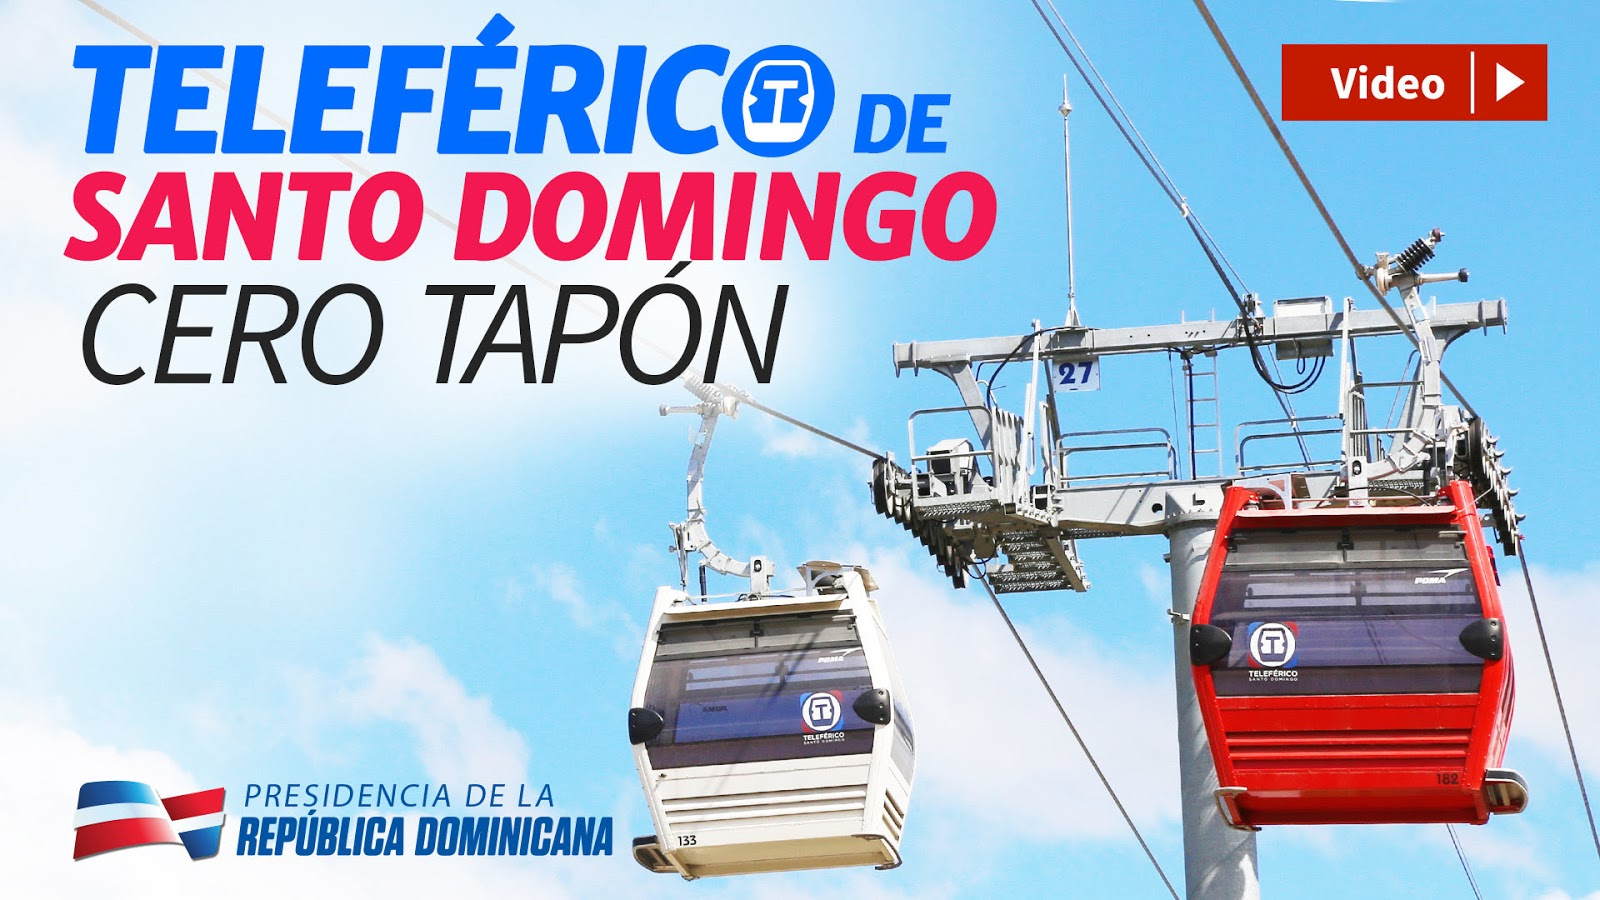 VIDEO: Teleférico de Santo Domingo. Sin humo, sin ruido